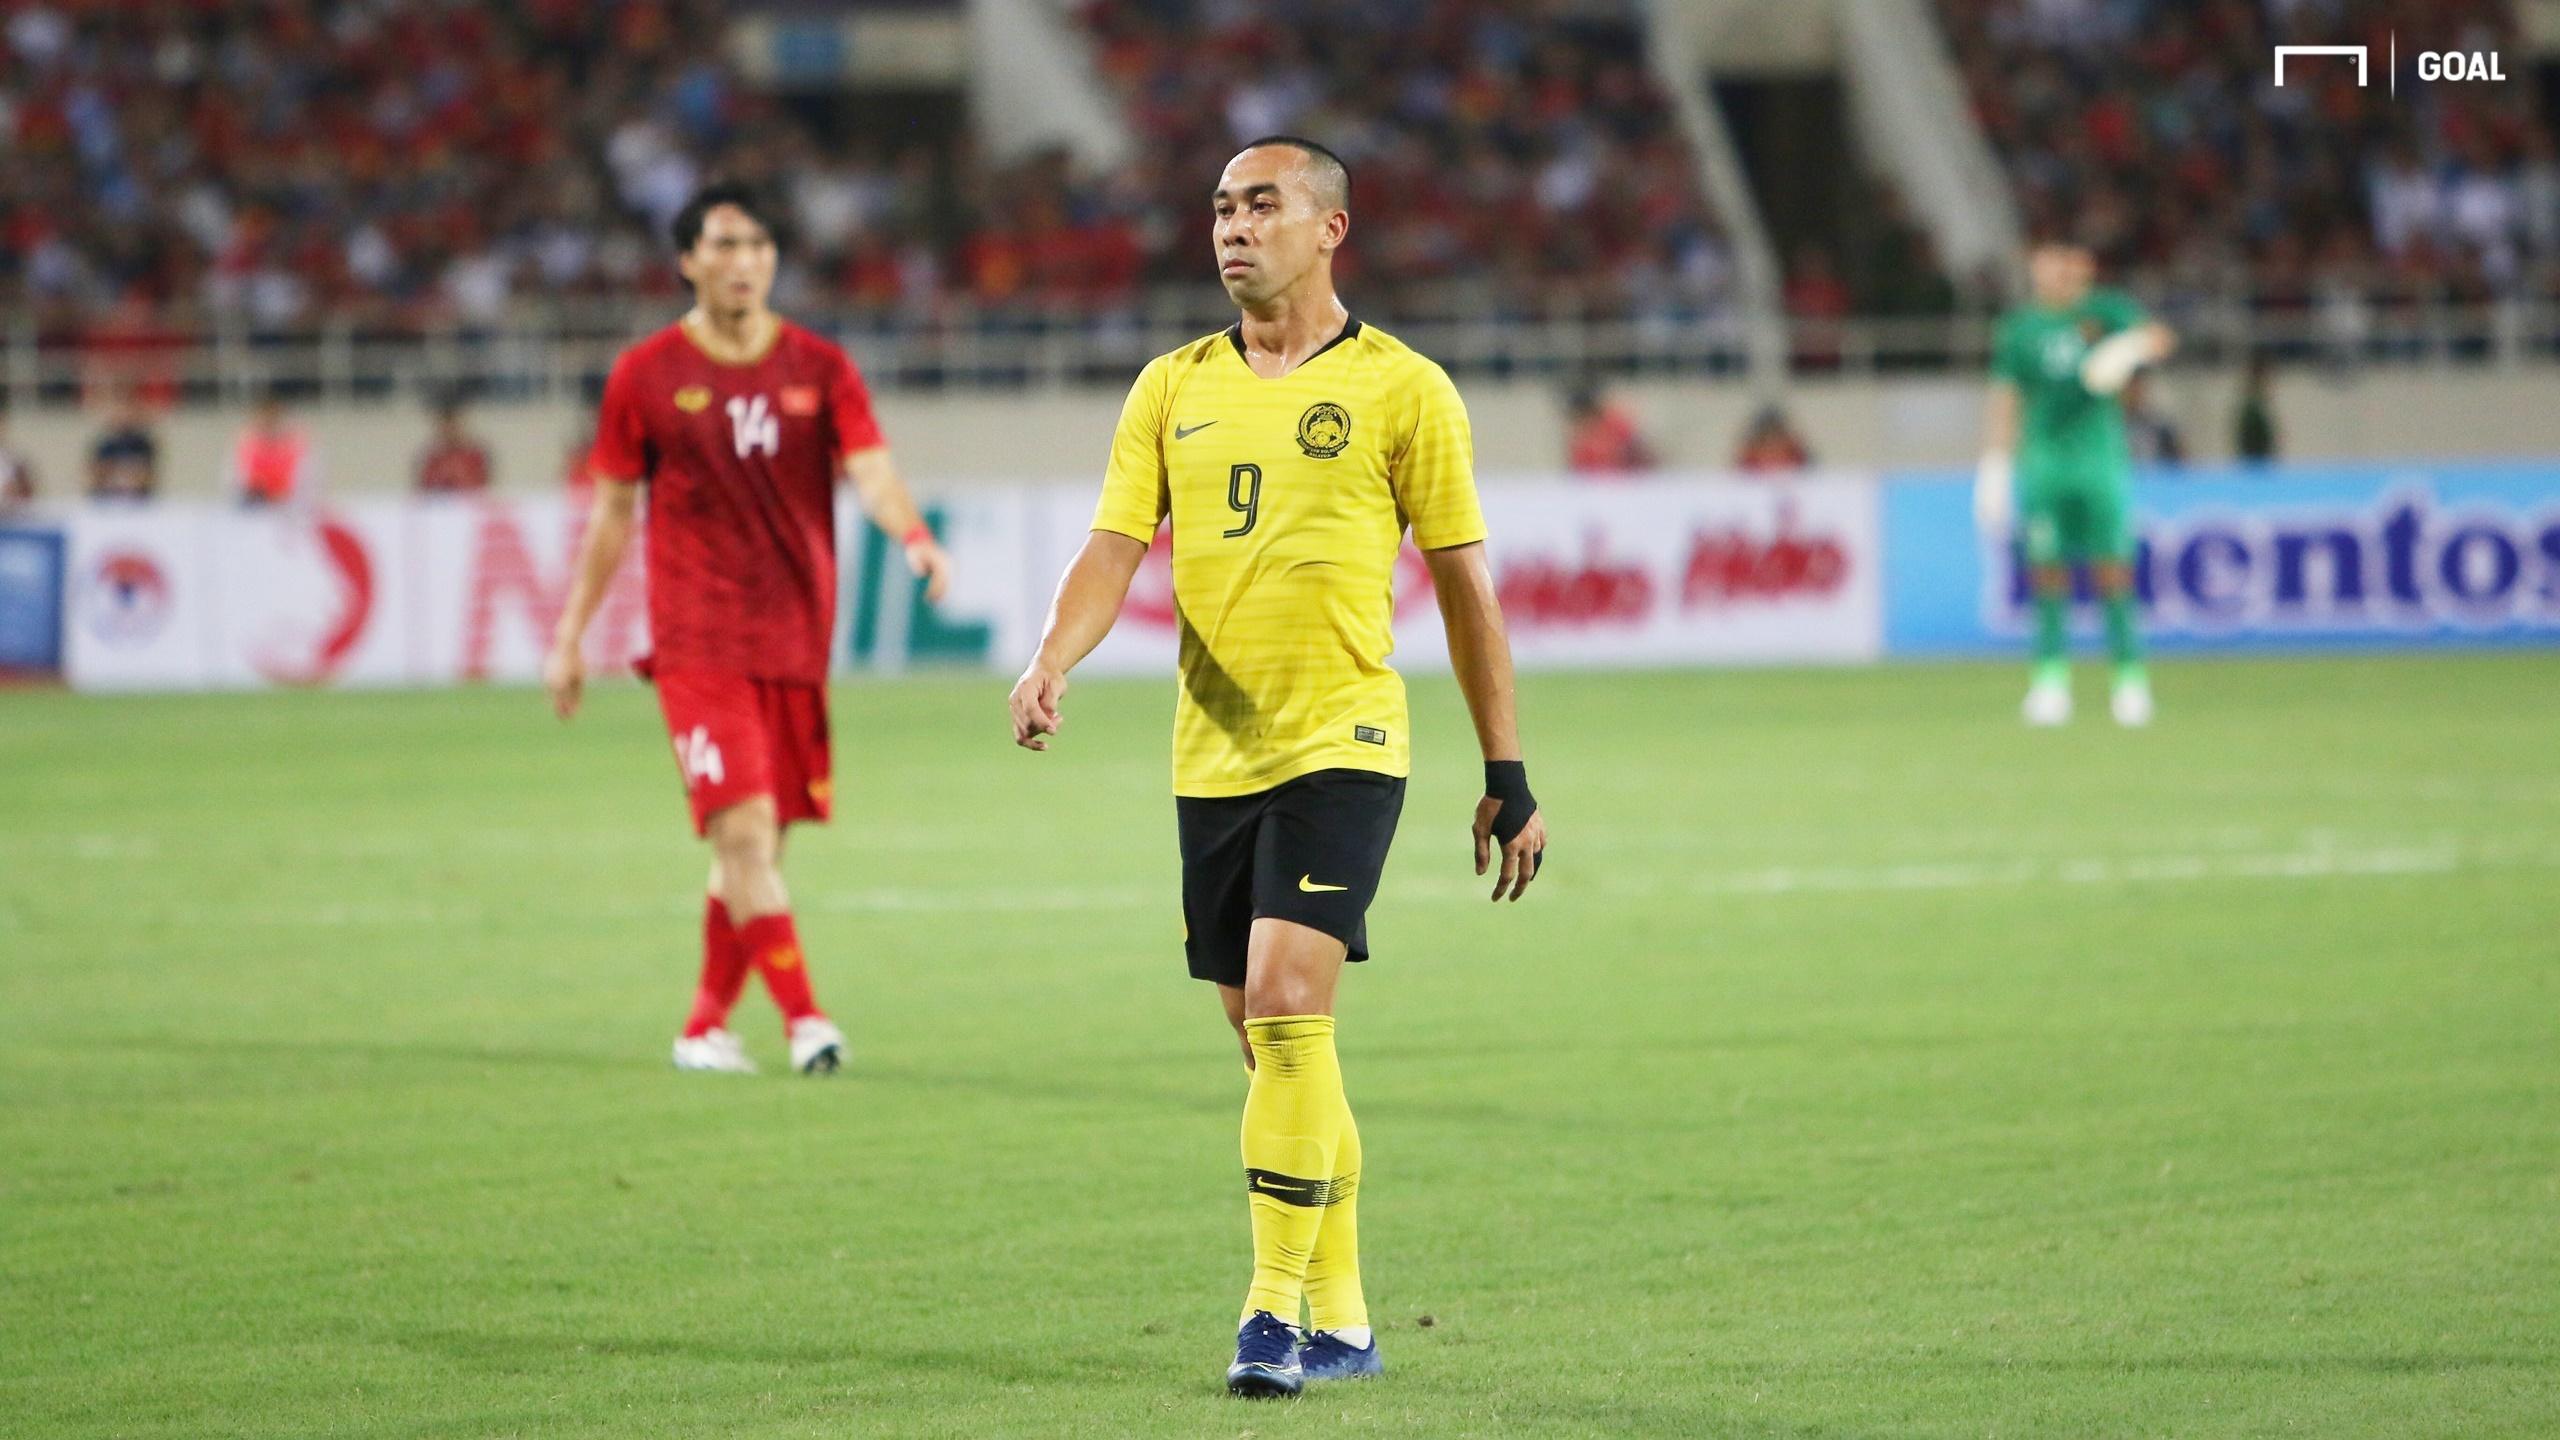 Norshahrul Idlan Talaha | Vietnam vs Malaysia | 2022 FIFA World Cup qualification (AFC)